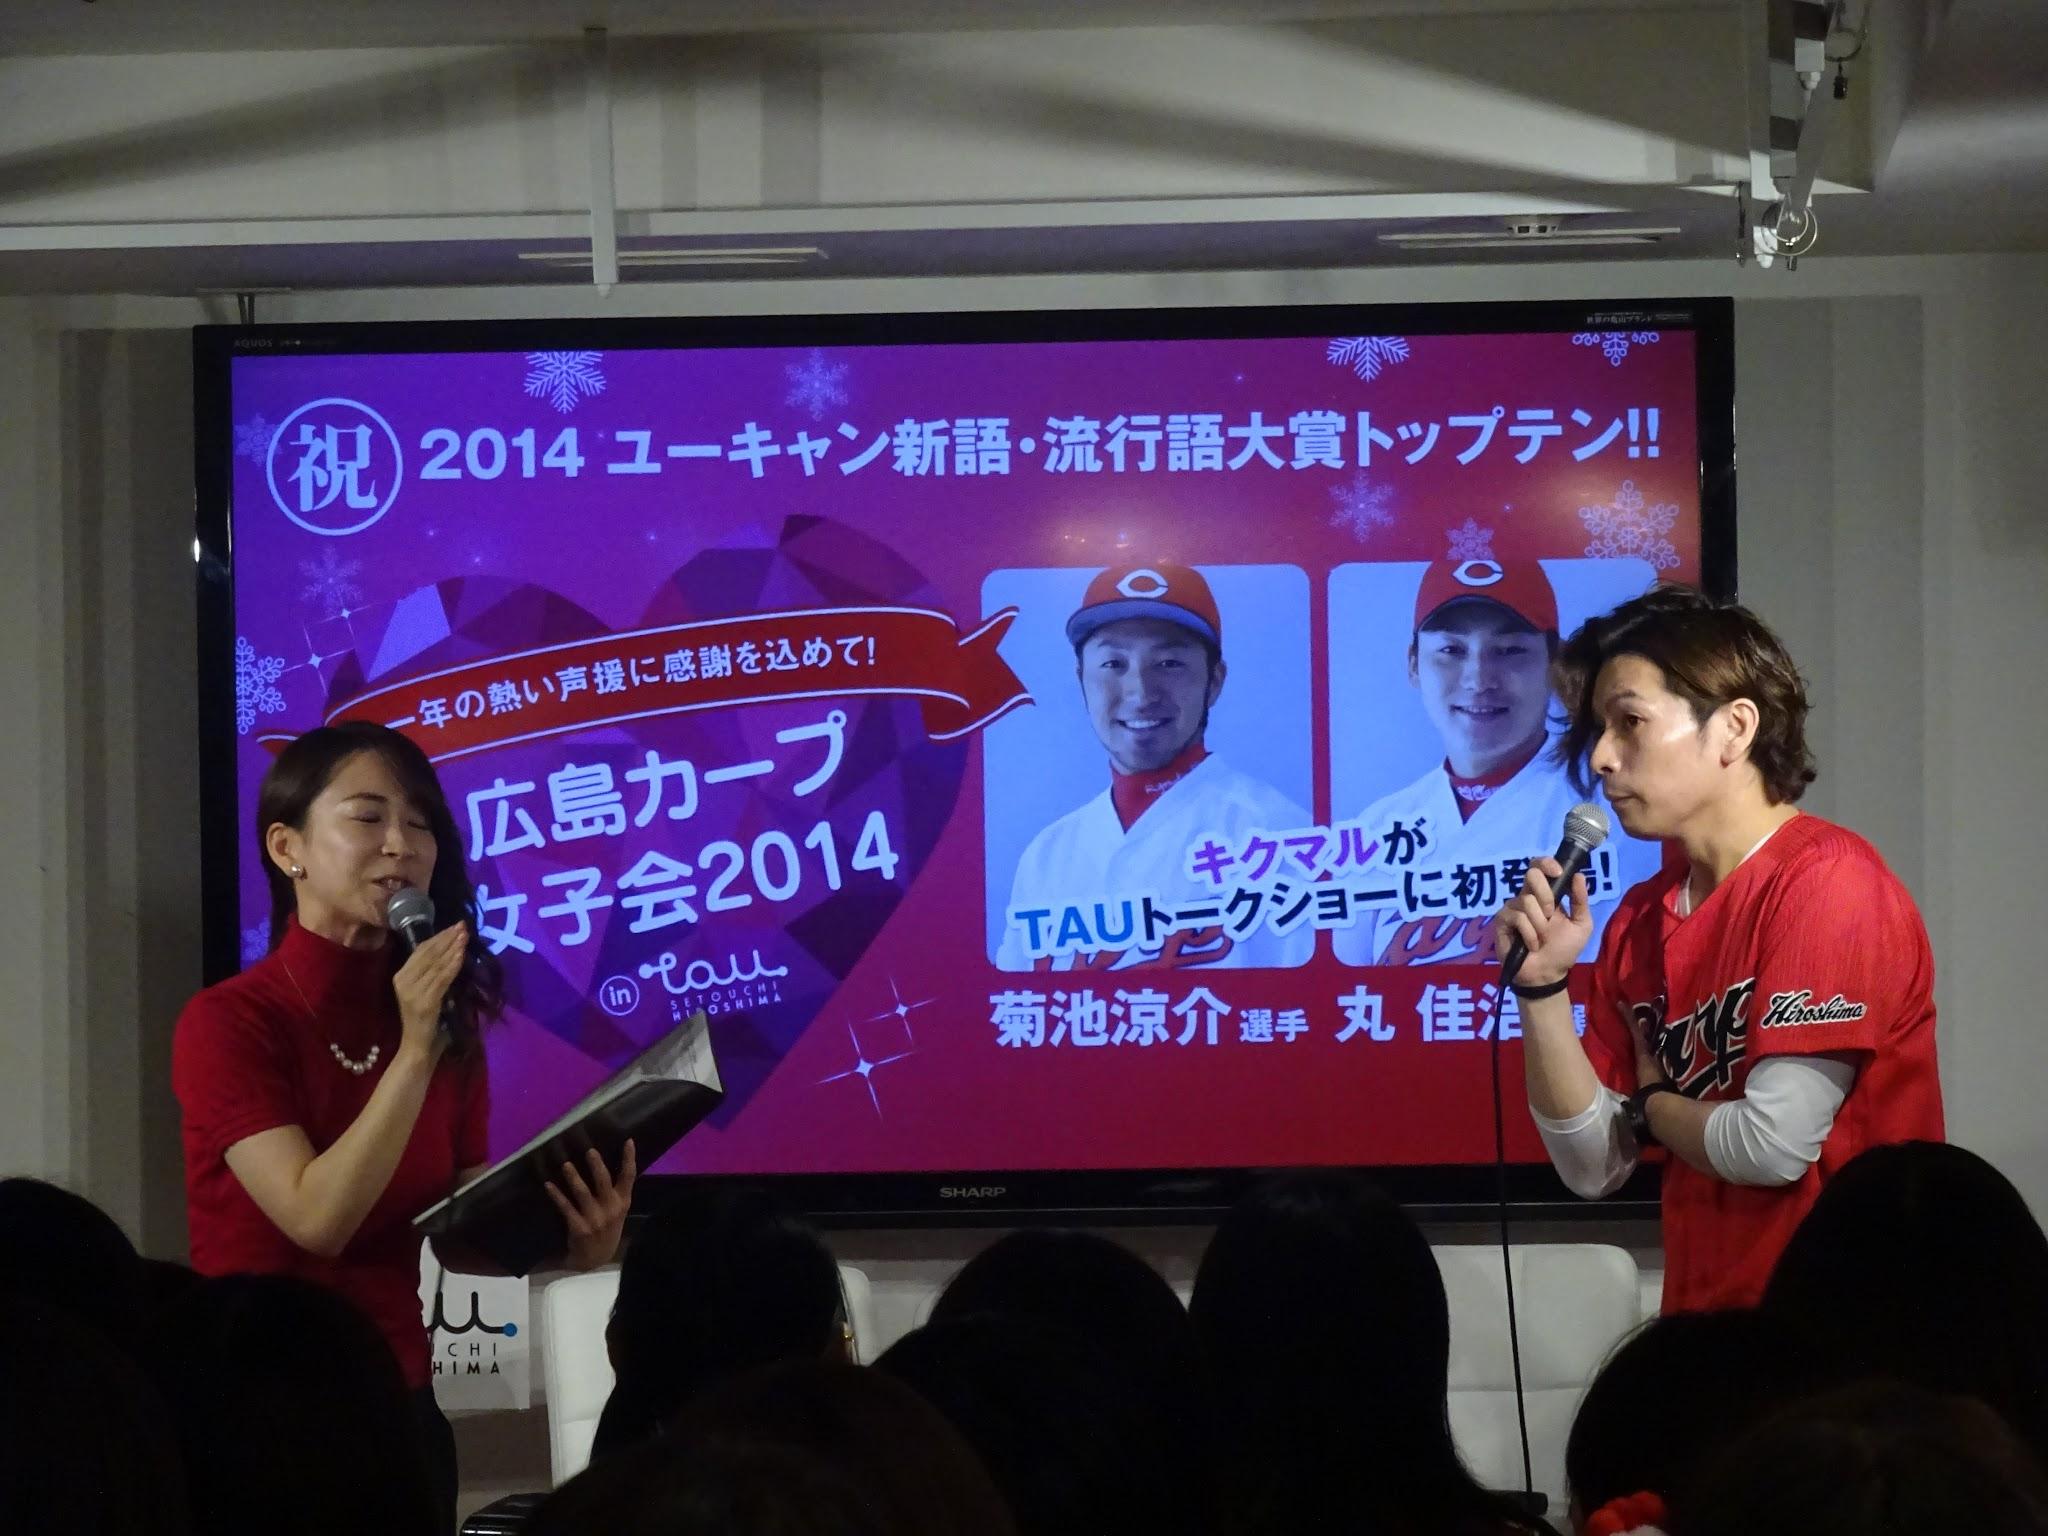 report 「カープ女子会2014 in TAU」